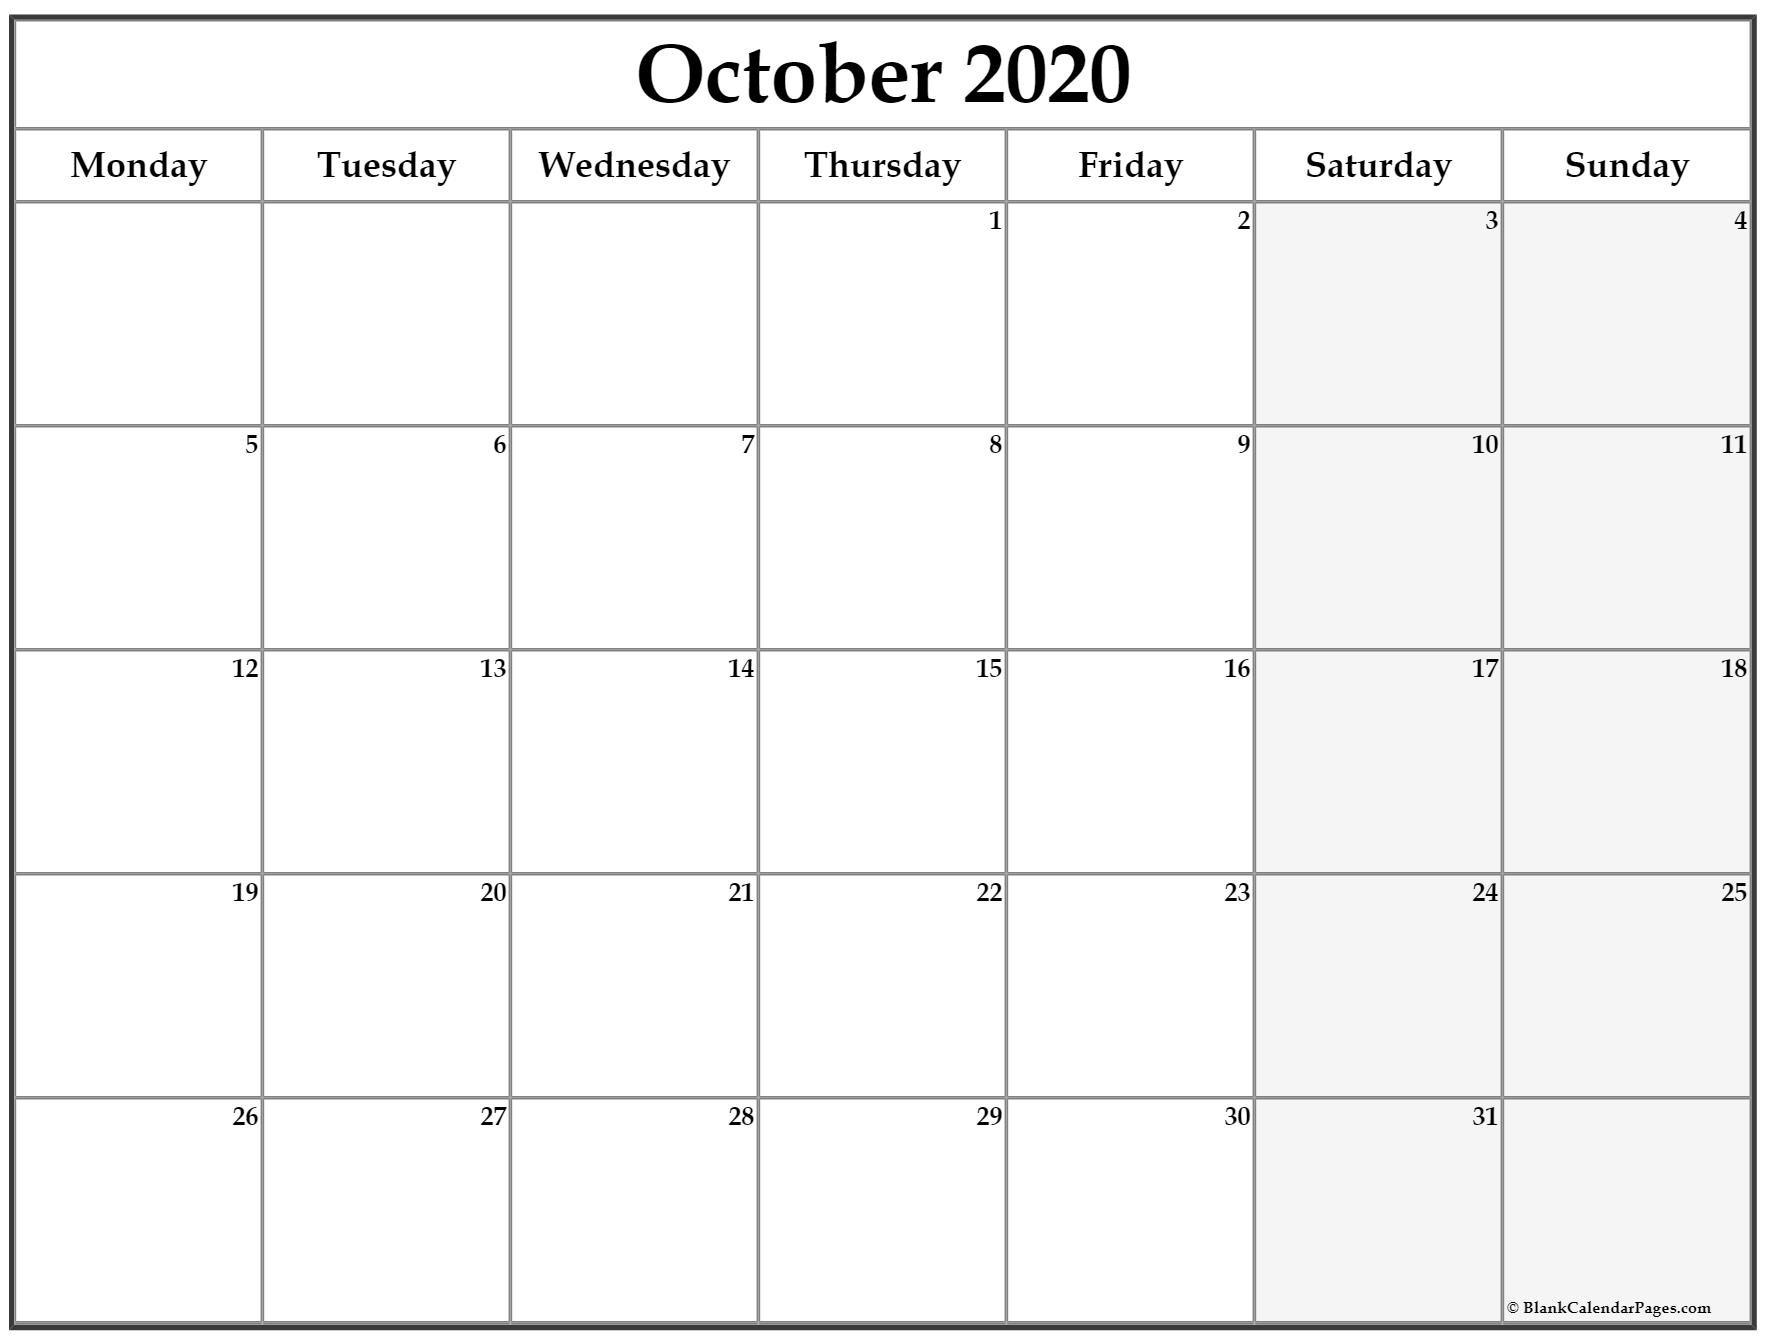 October 2020 Monday Calendar | Monday To Sunday Saturday Thur Friday Schedule